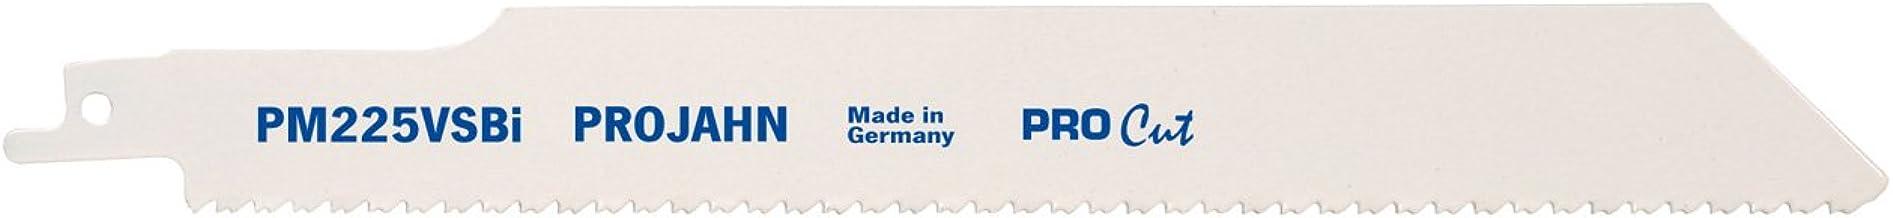 Projahn 64237 PM225VS - Hoja de sierra sable (205 x 10-14 mm, bimetal, VE5, Pro Cut)